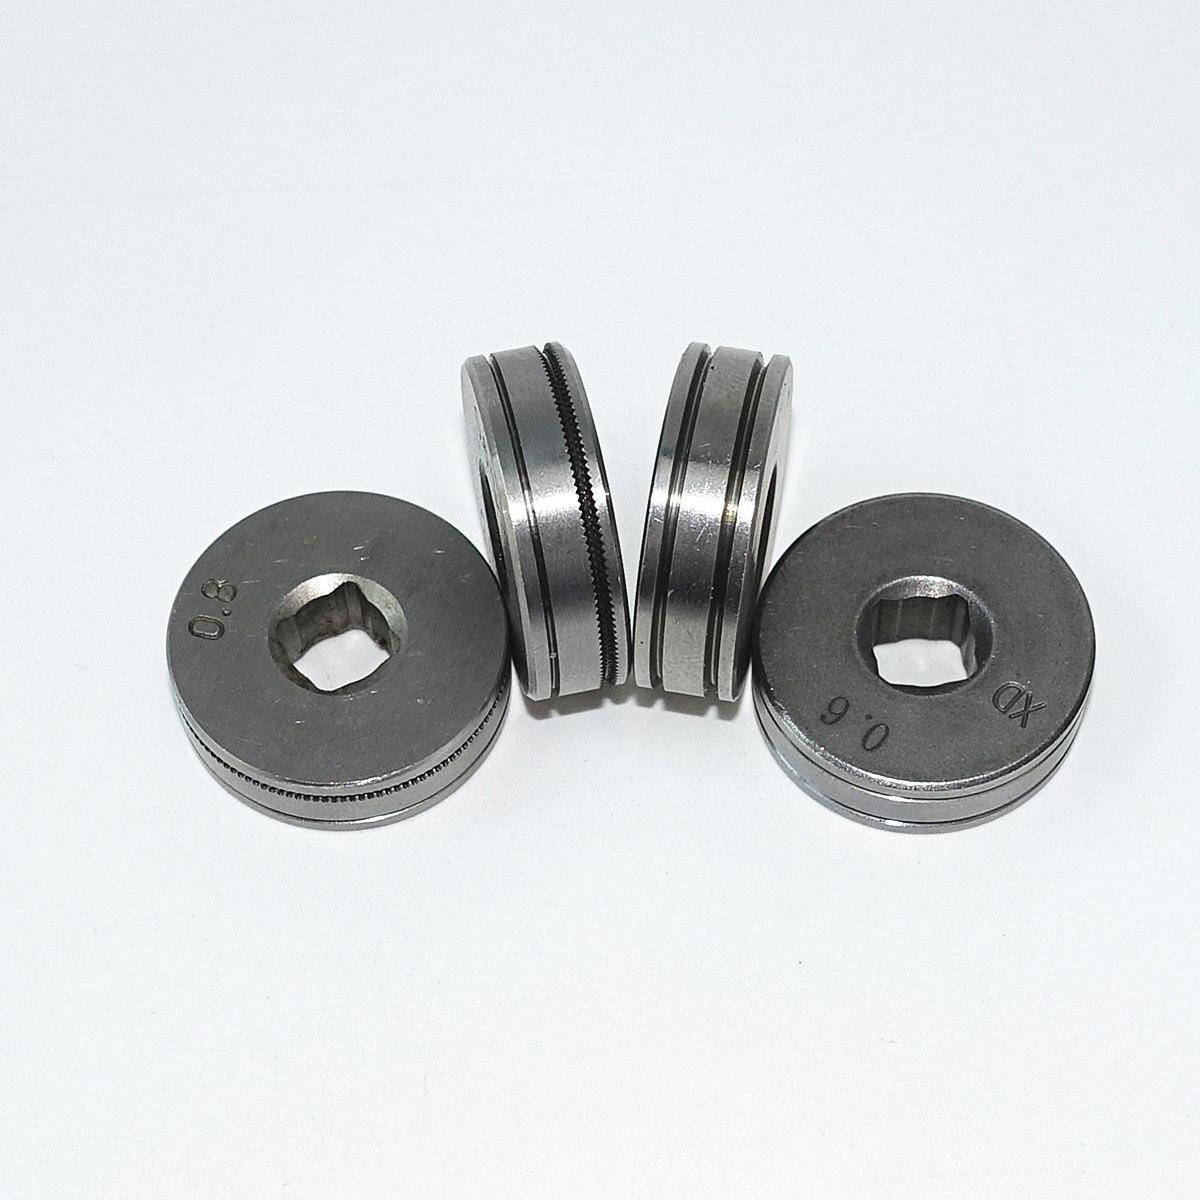 MIG Welding Machine Wire Feeding Roll V U K Knurl Groove 0.6mm 0.8mm 1.0mm 1.2mm Of Steel Aluminum Flux Cord Welding Wire SSJ-16